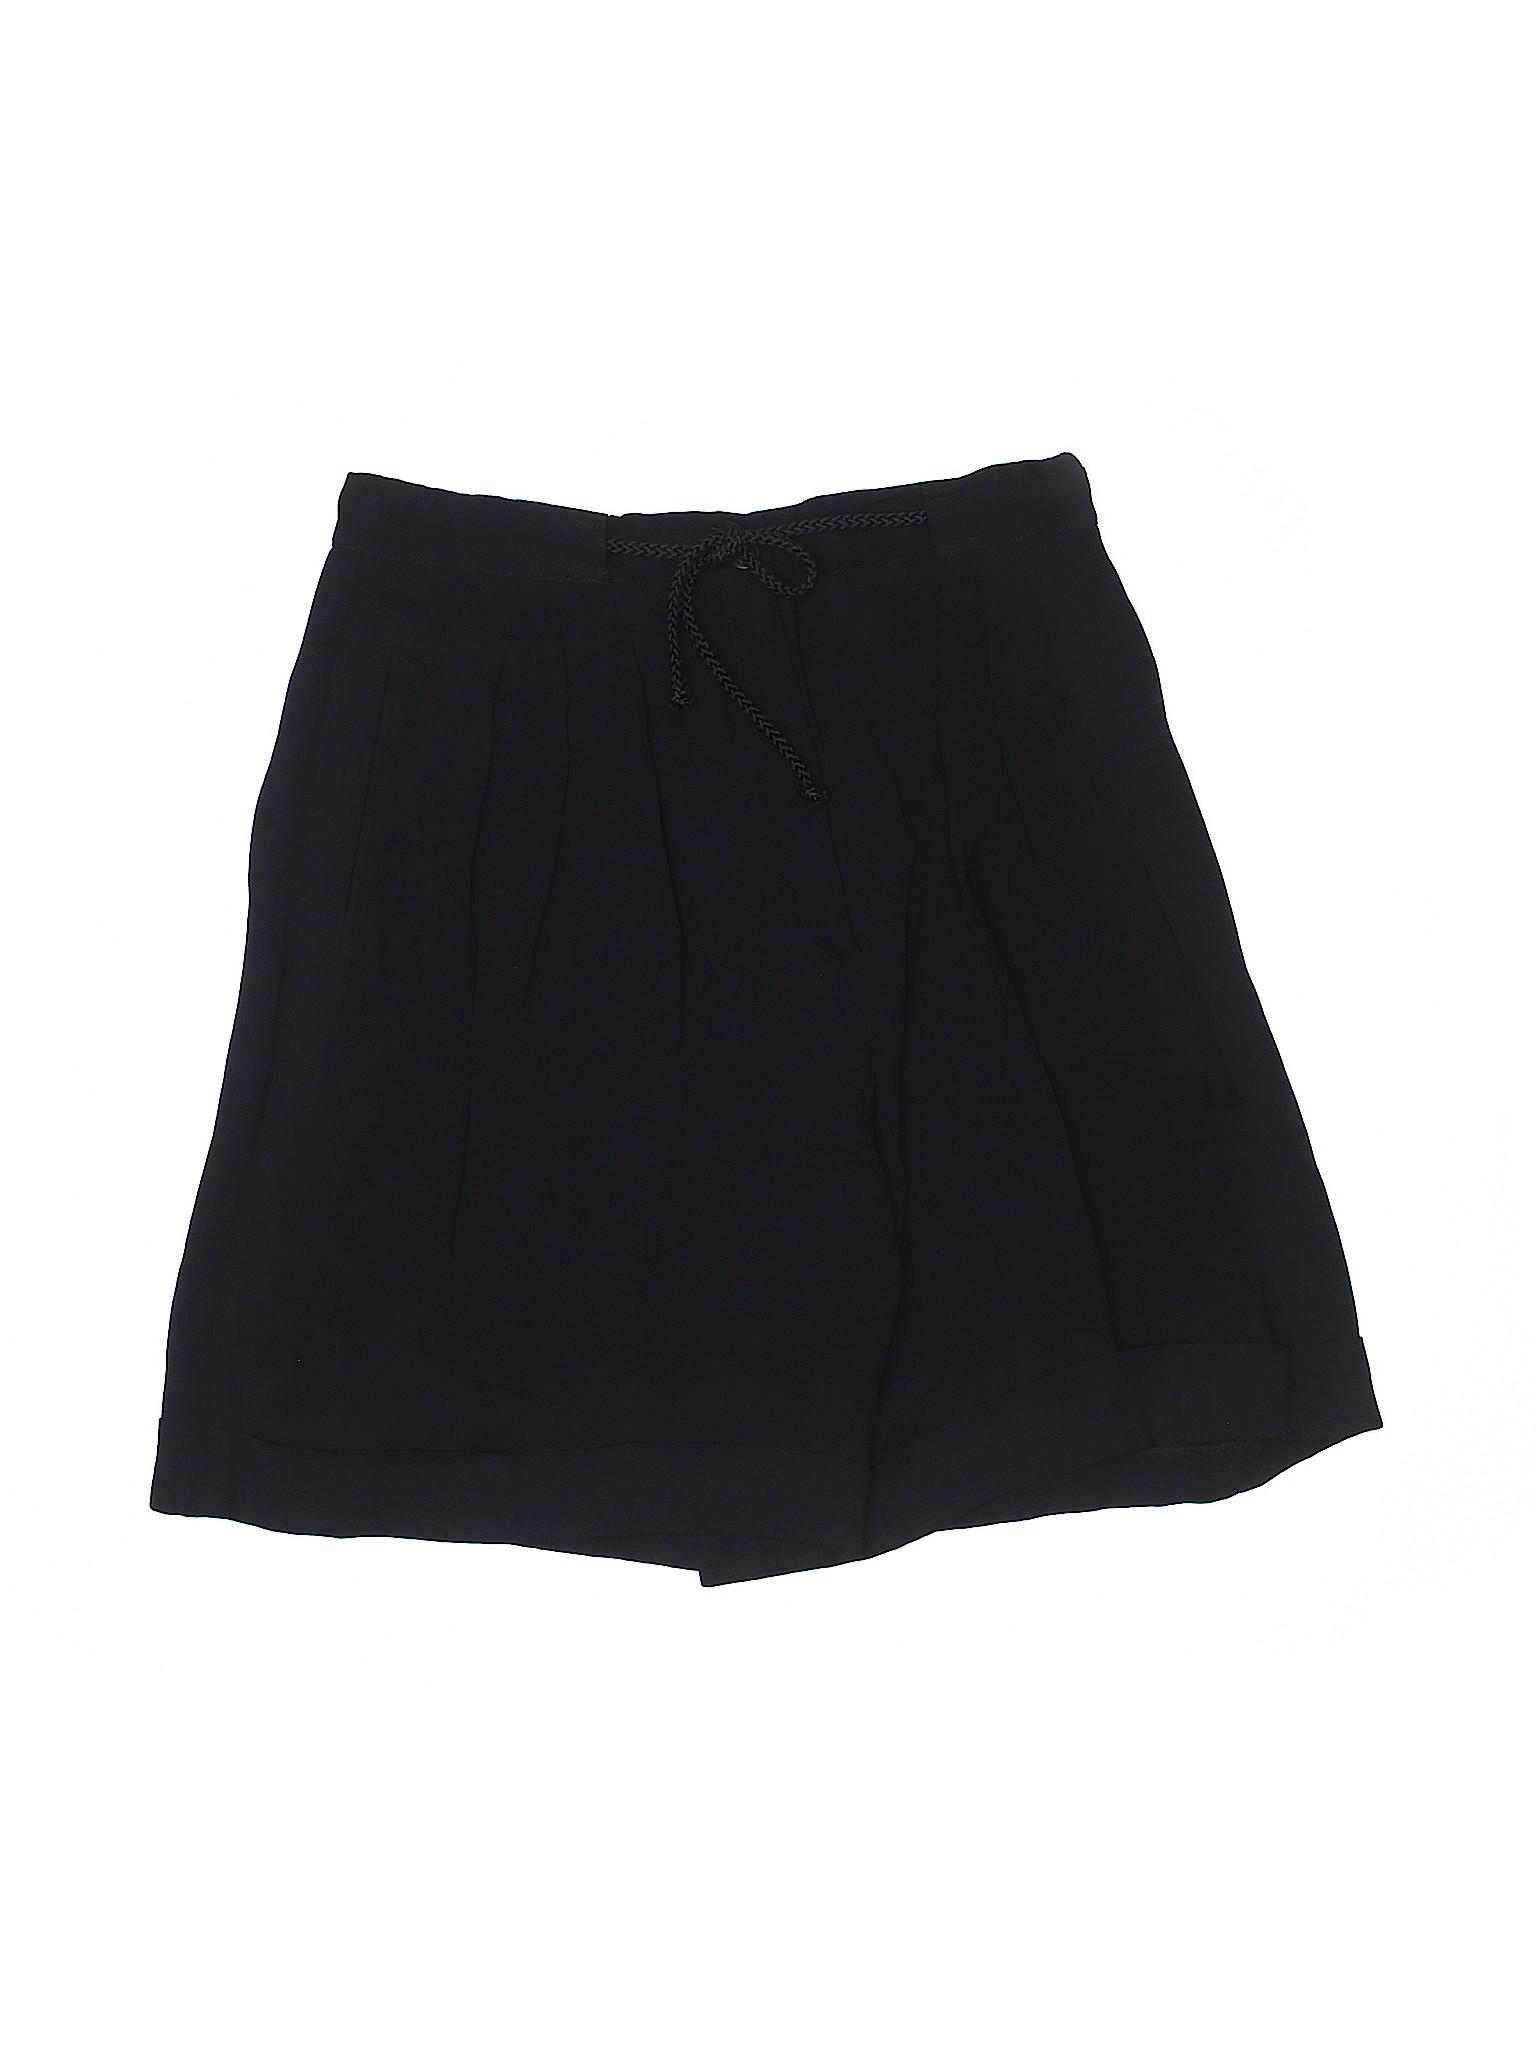 Emporio Boutique Dressy Armani Boutique Emporio Shorts nqwx4fBF